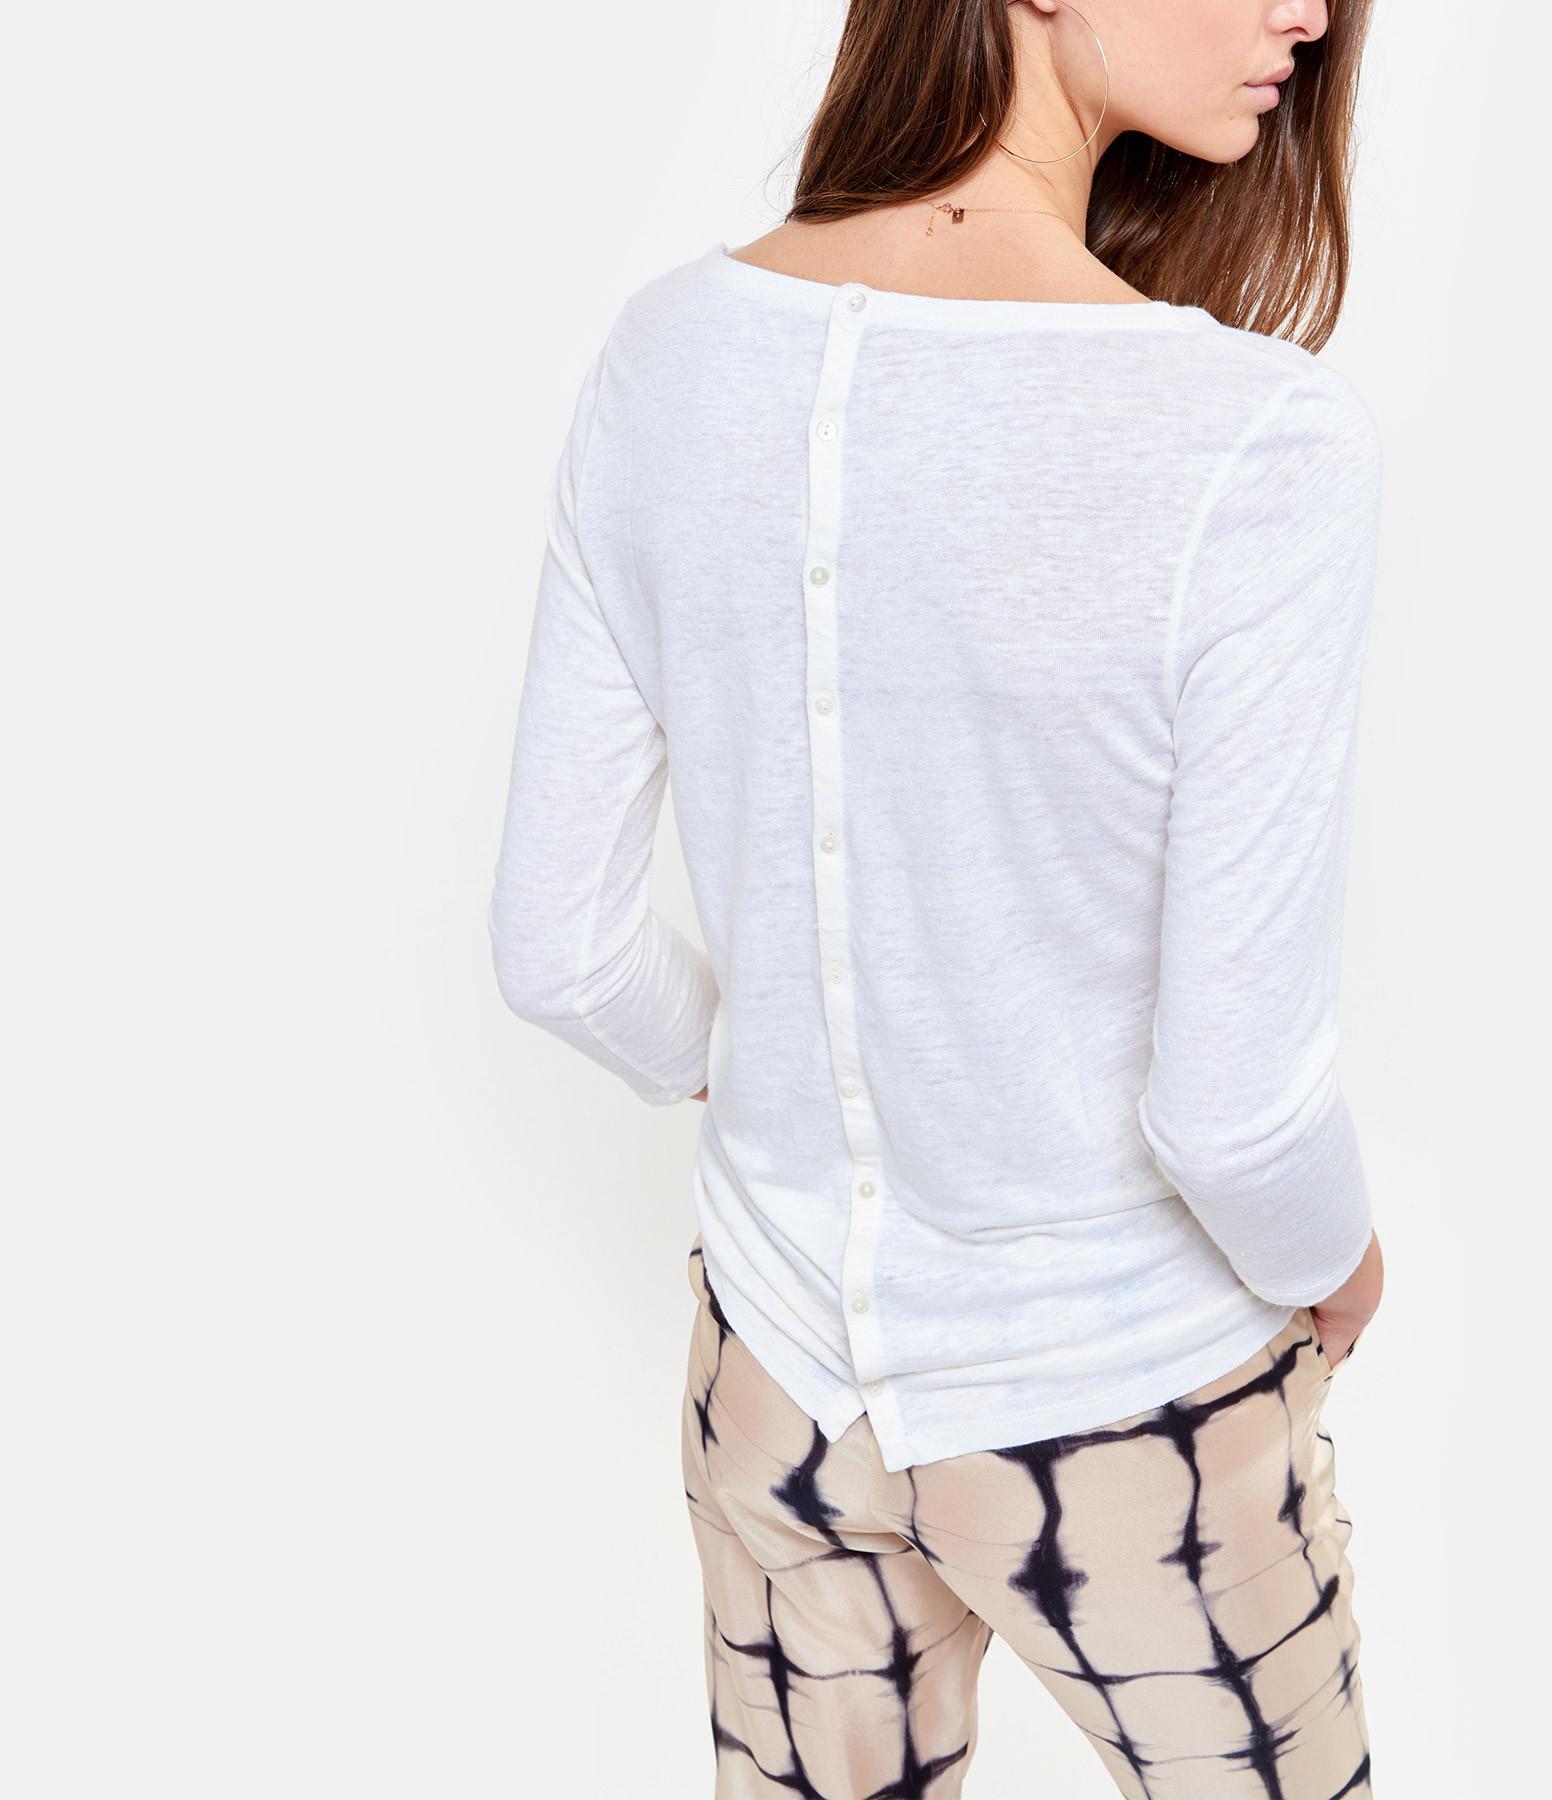 MAJESTIC FILATURES - Tee-shirt Manches 3/4 Lin Blanc